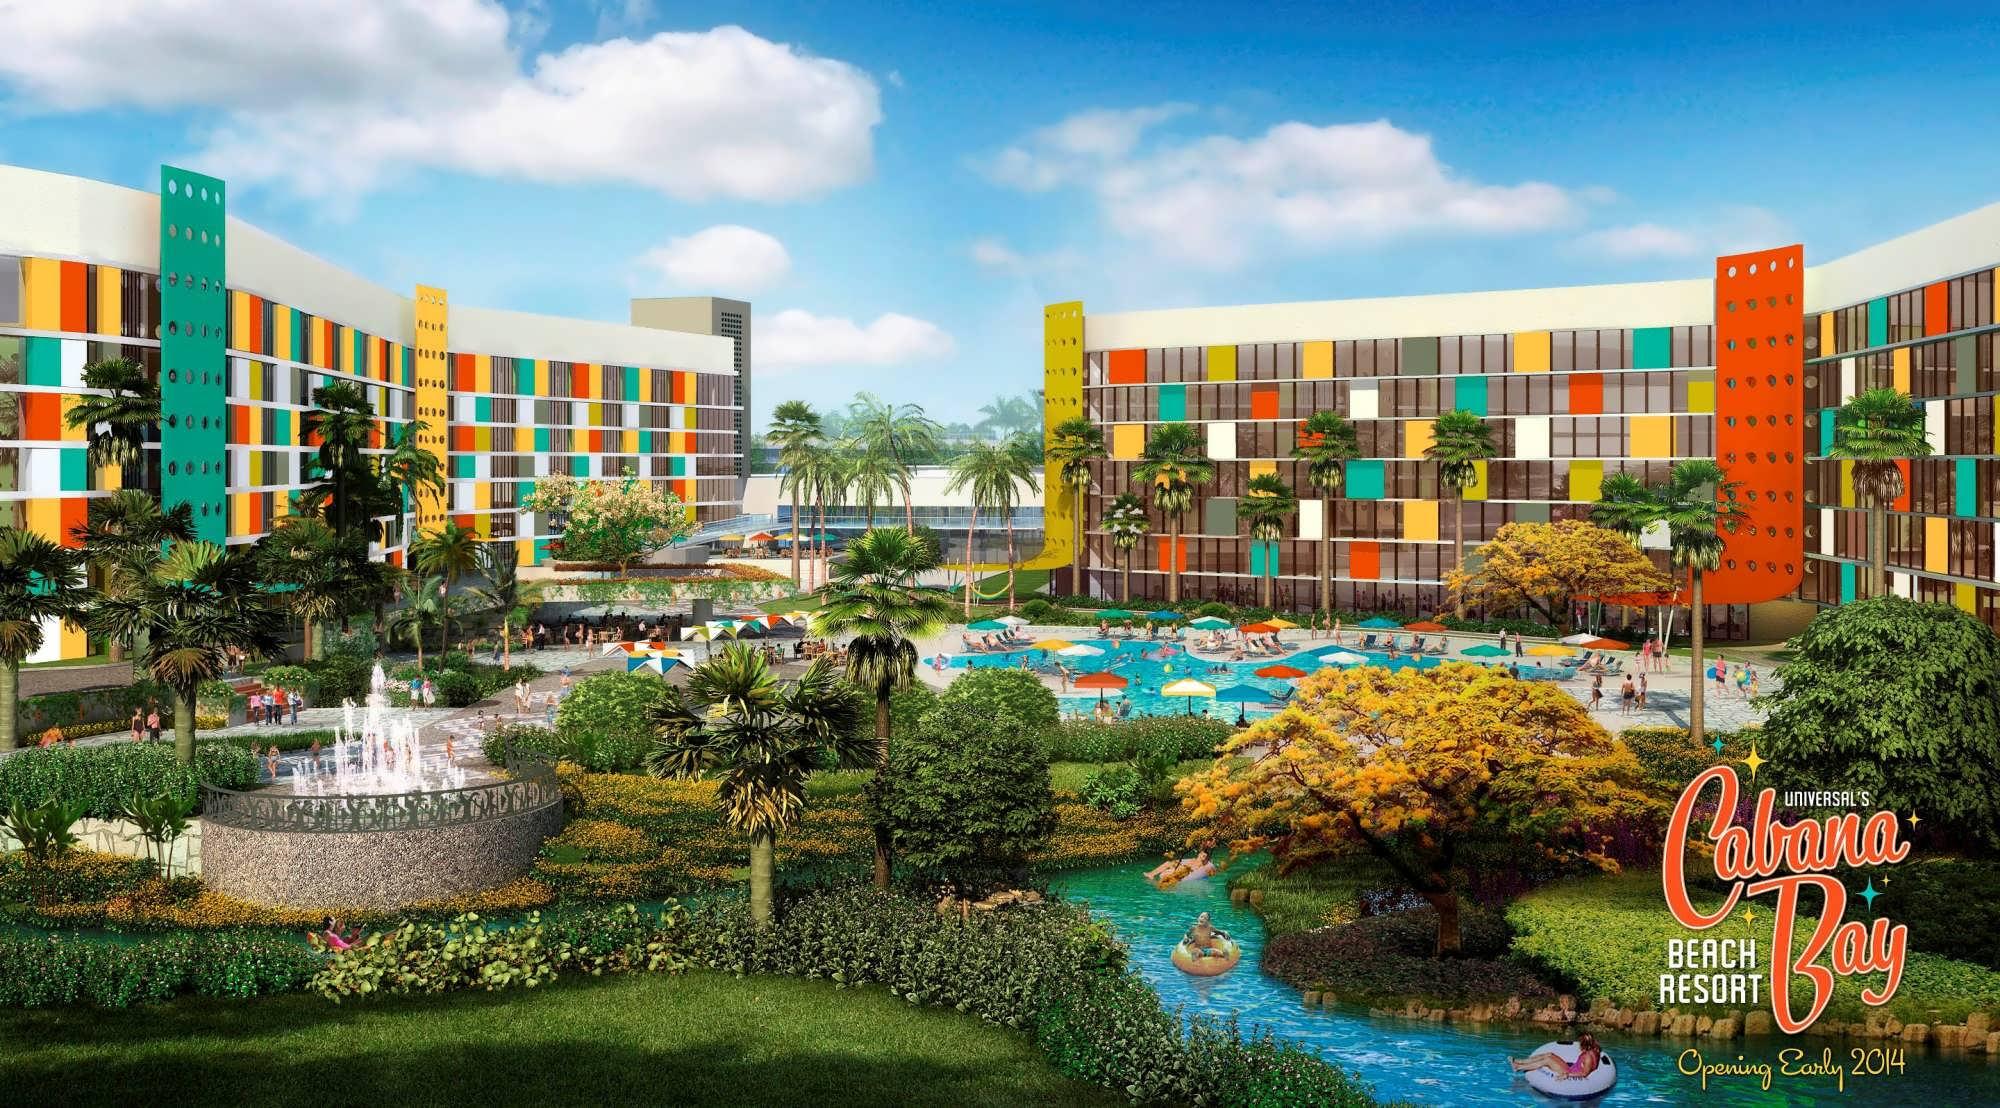 Cabana Bay Beach Resort at Universal Orlando First look